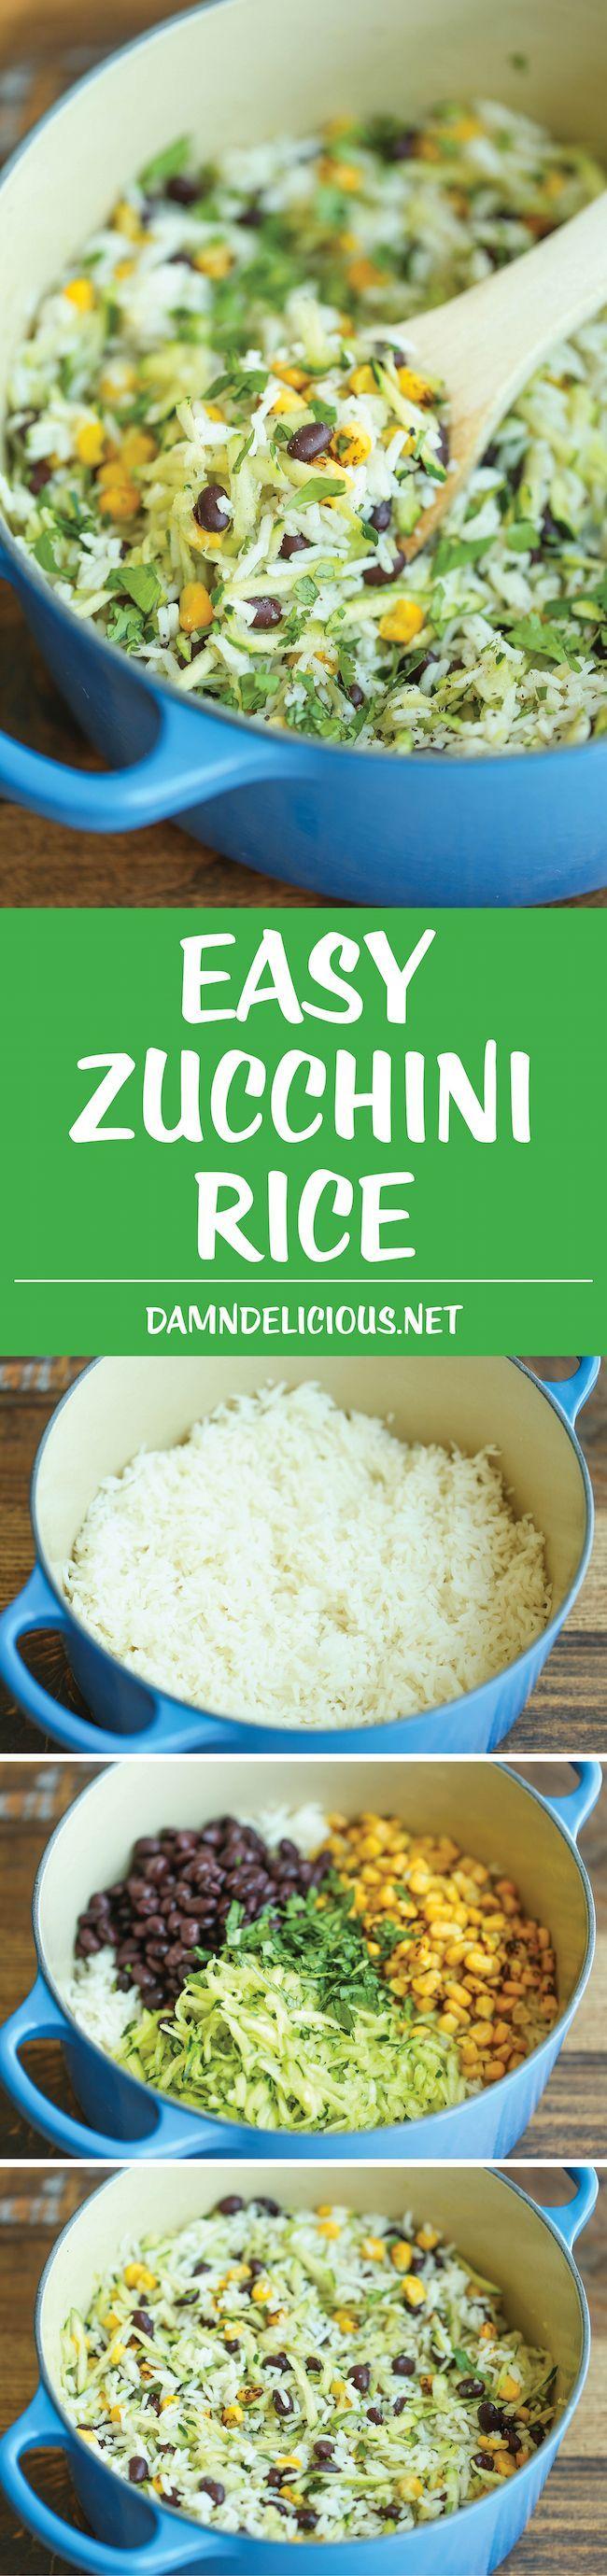 Blue apron zucchini rice - 25 Best Ideas About Zucchini Rice On Pinterest Easy Zucchini Recipes Vegan Zucchini Recipes And Cheesy Zucchini Rice